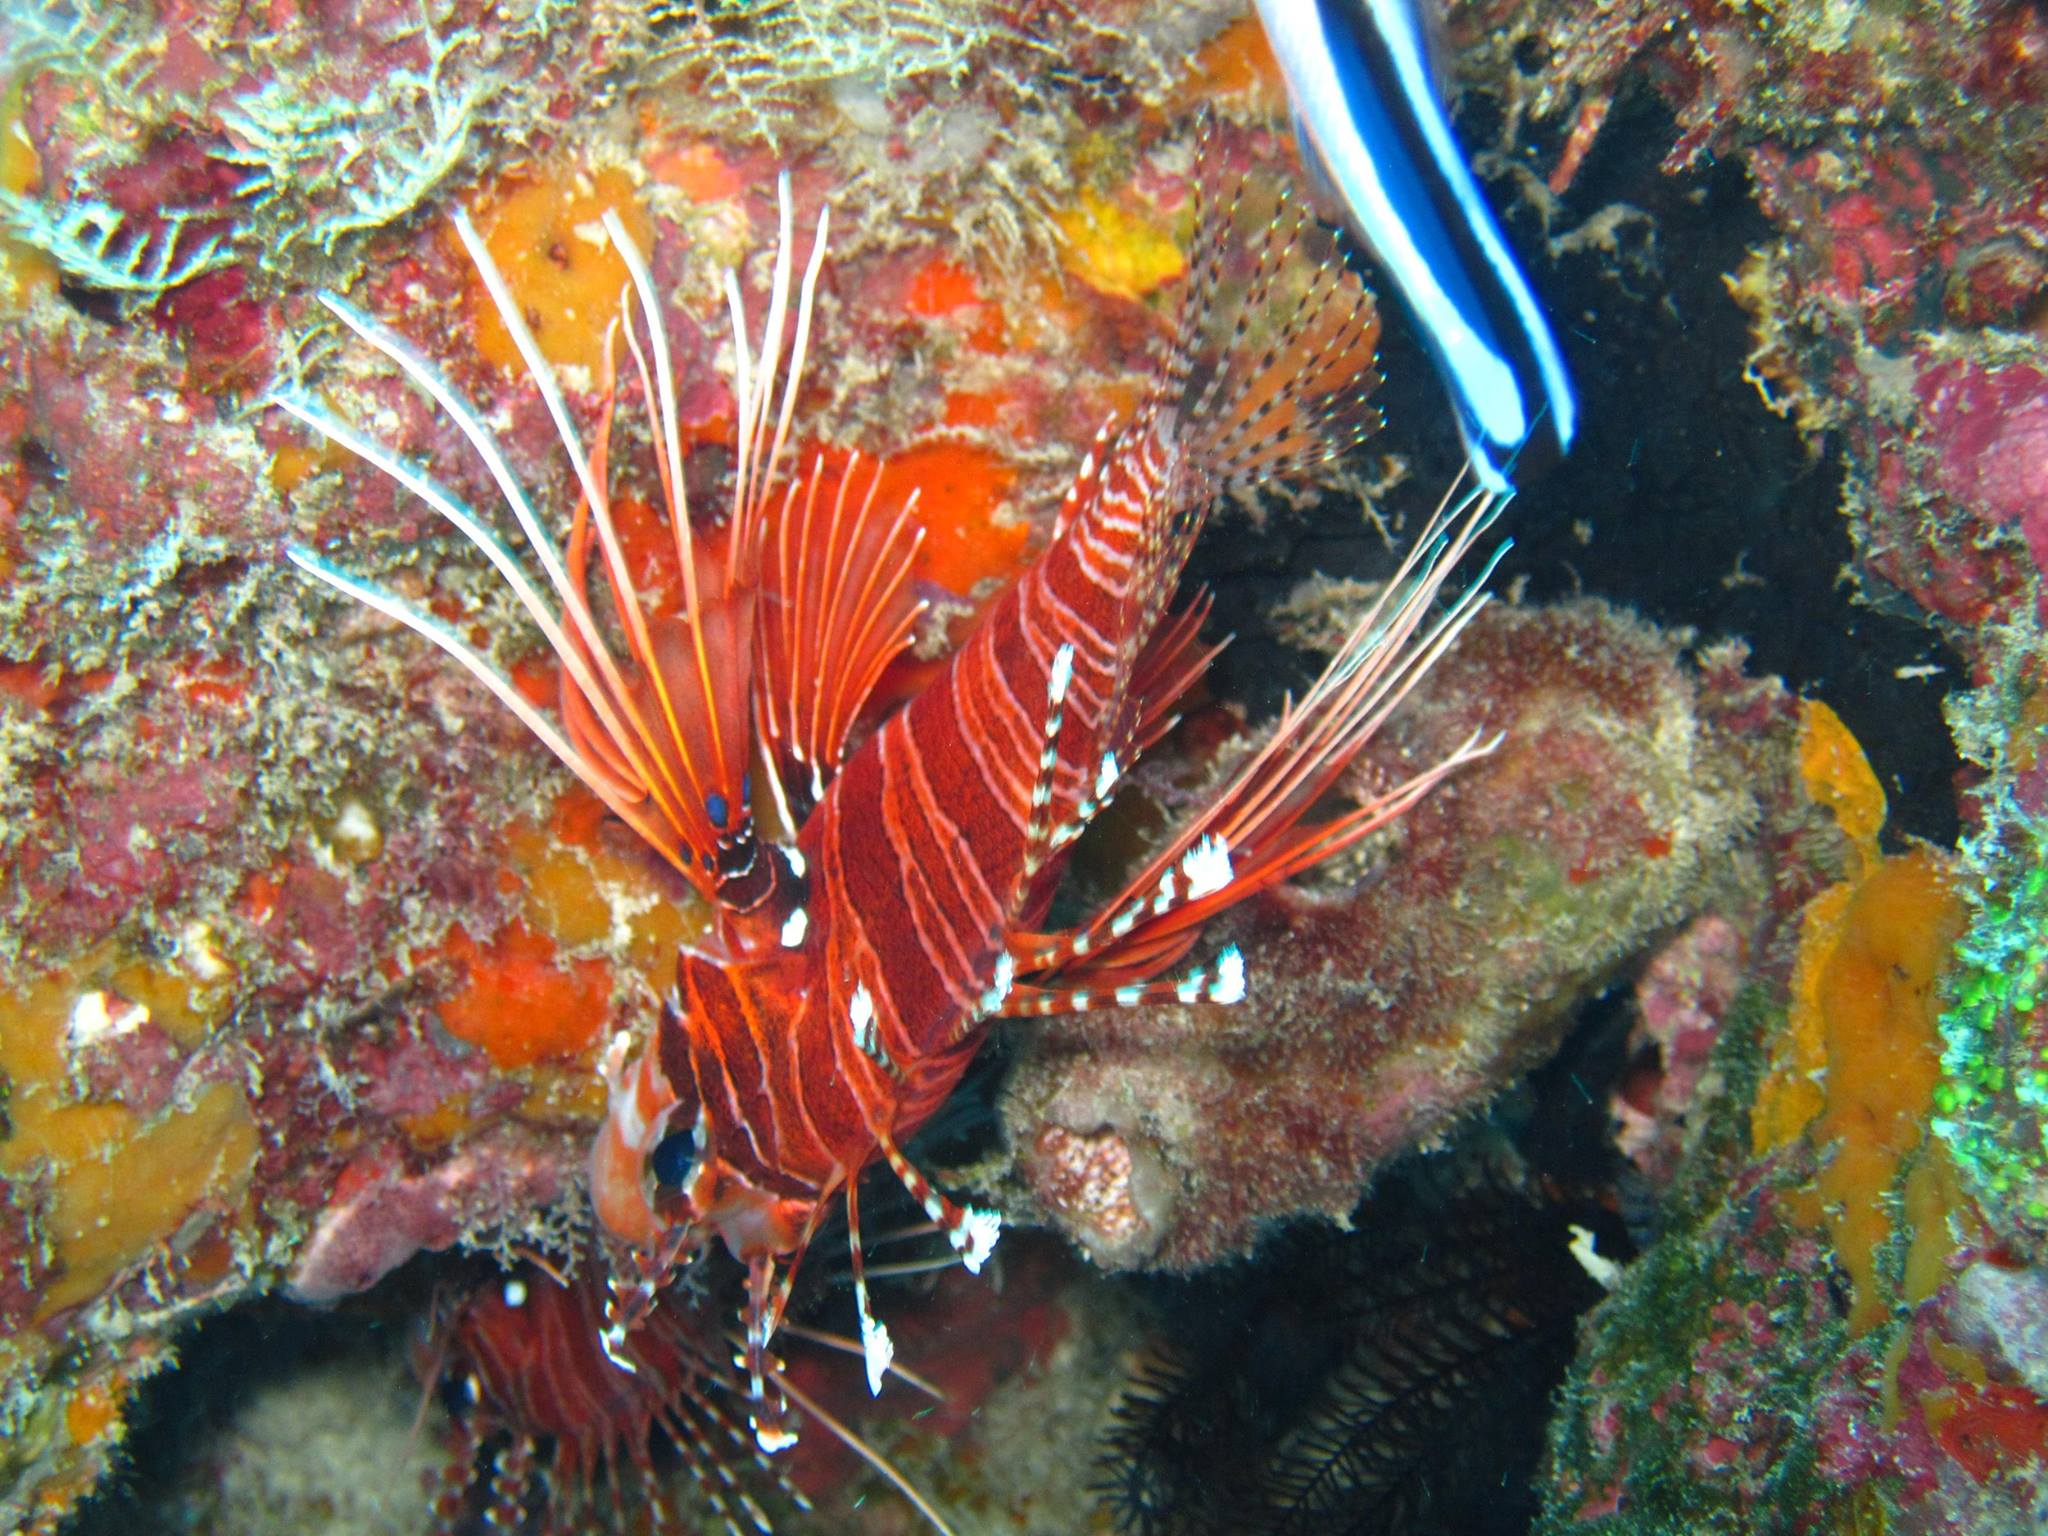 invite-to-paradise-sri-lanka-and-maldives-specialists-travel-agent-tour-operator-customer-review-feedback-joel-rhian-fish-3.jpg